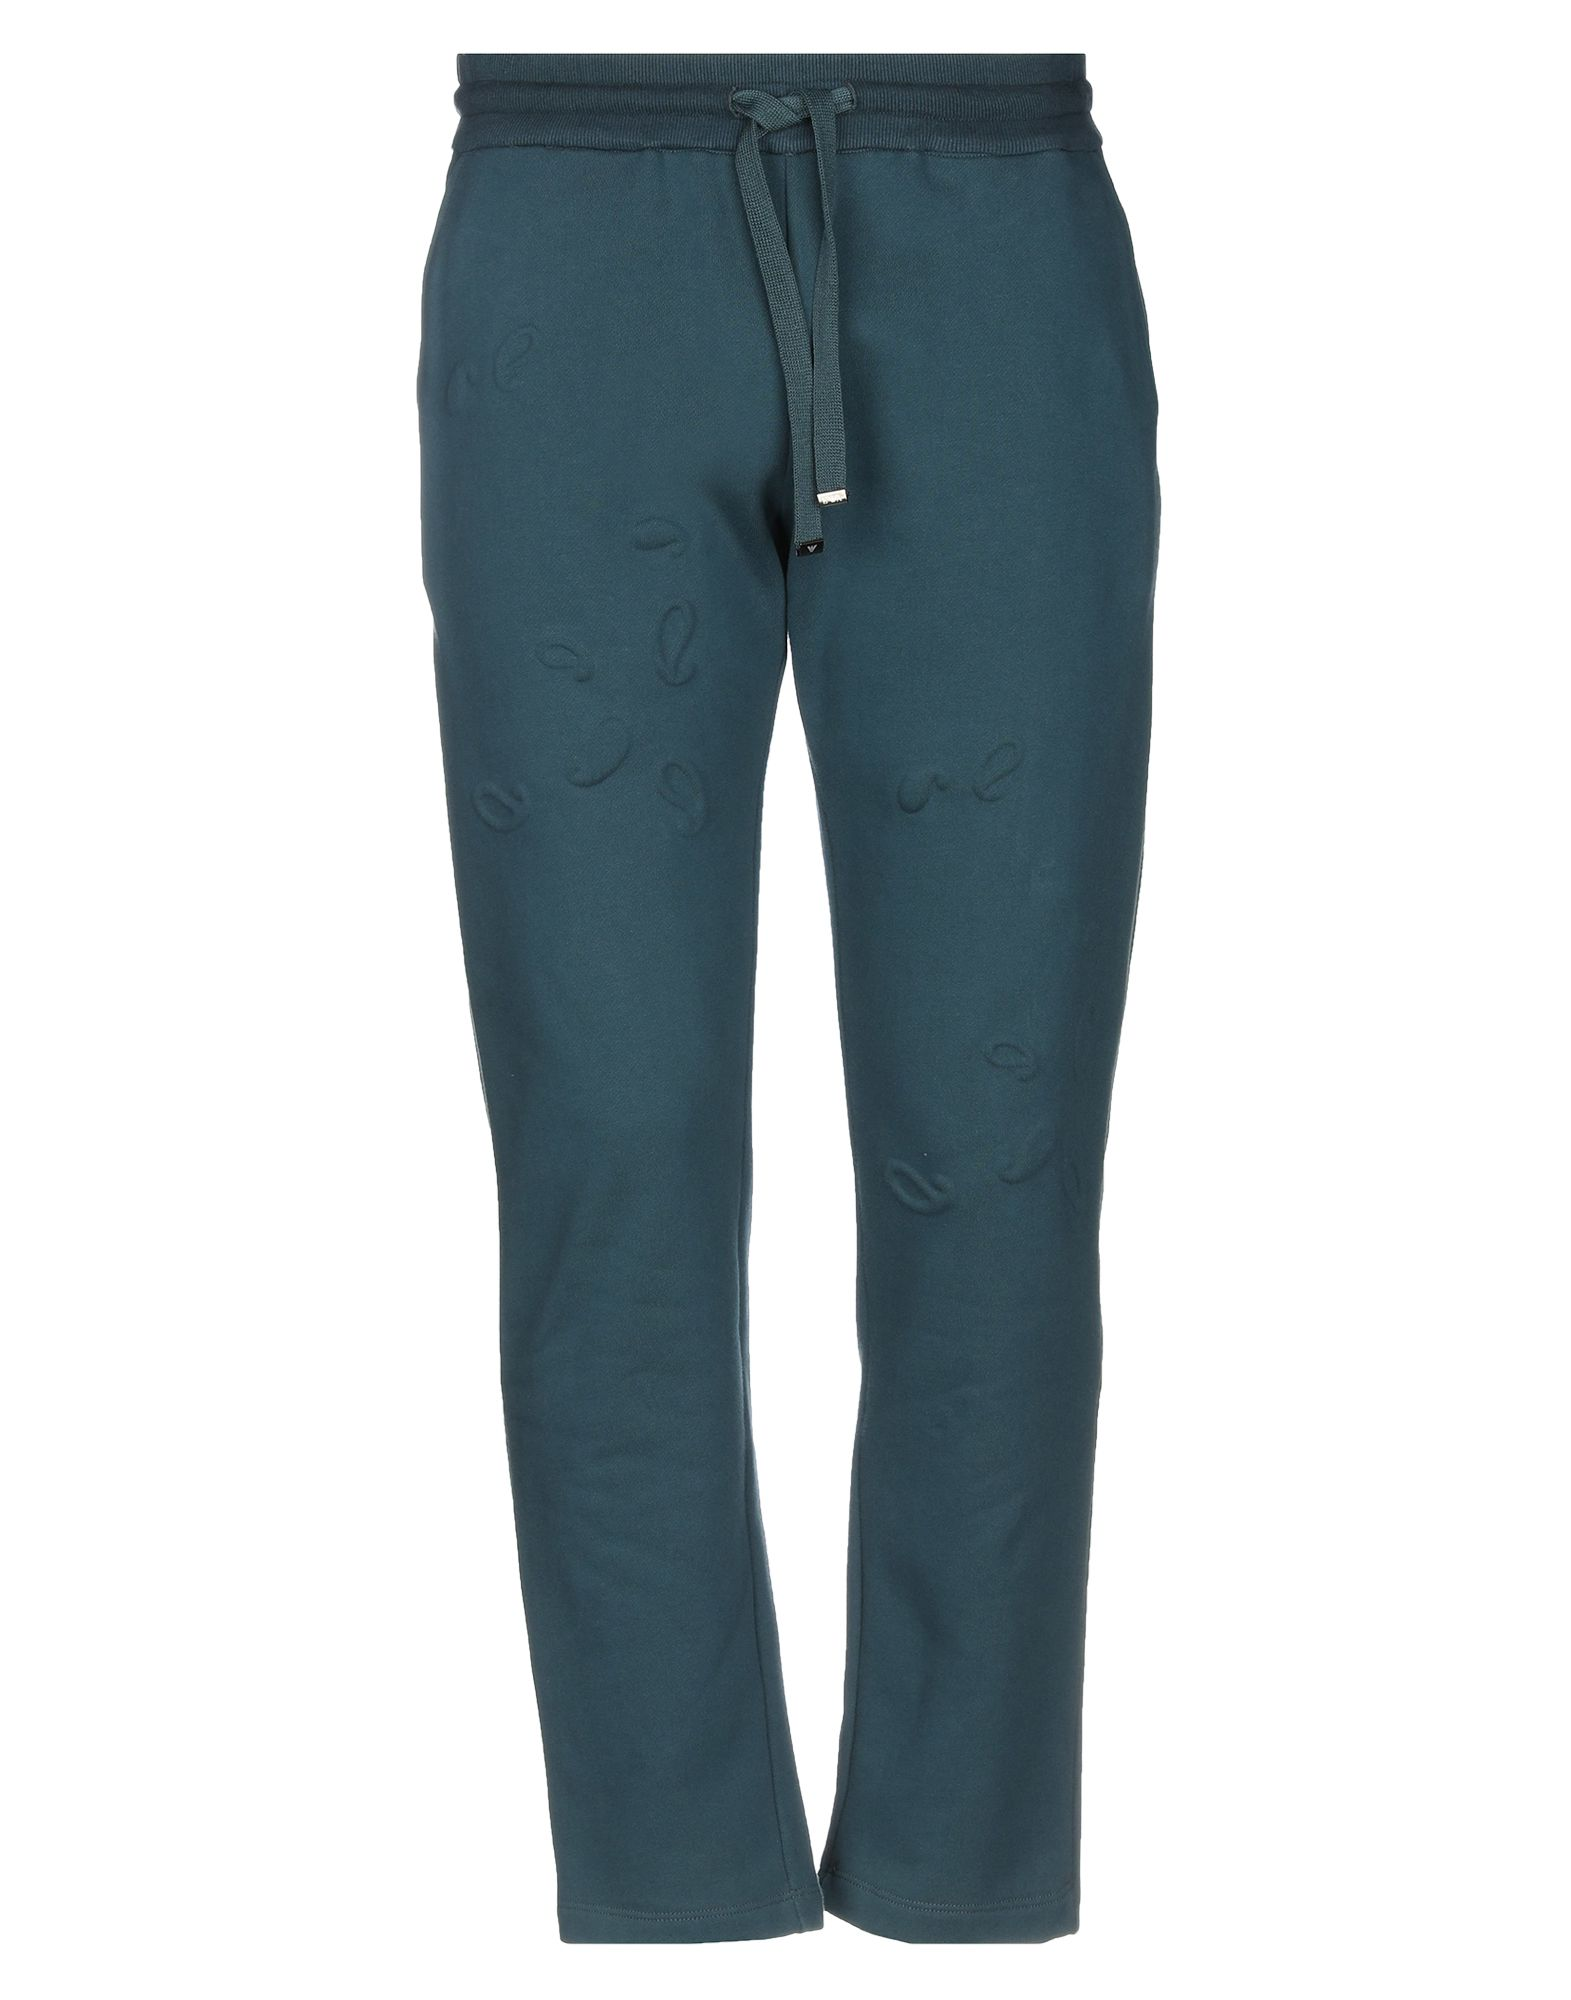 Pantalone Pantalone Pantalone Emporio Armani uomo - 13373084KT 2d4